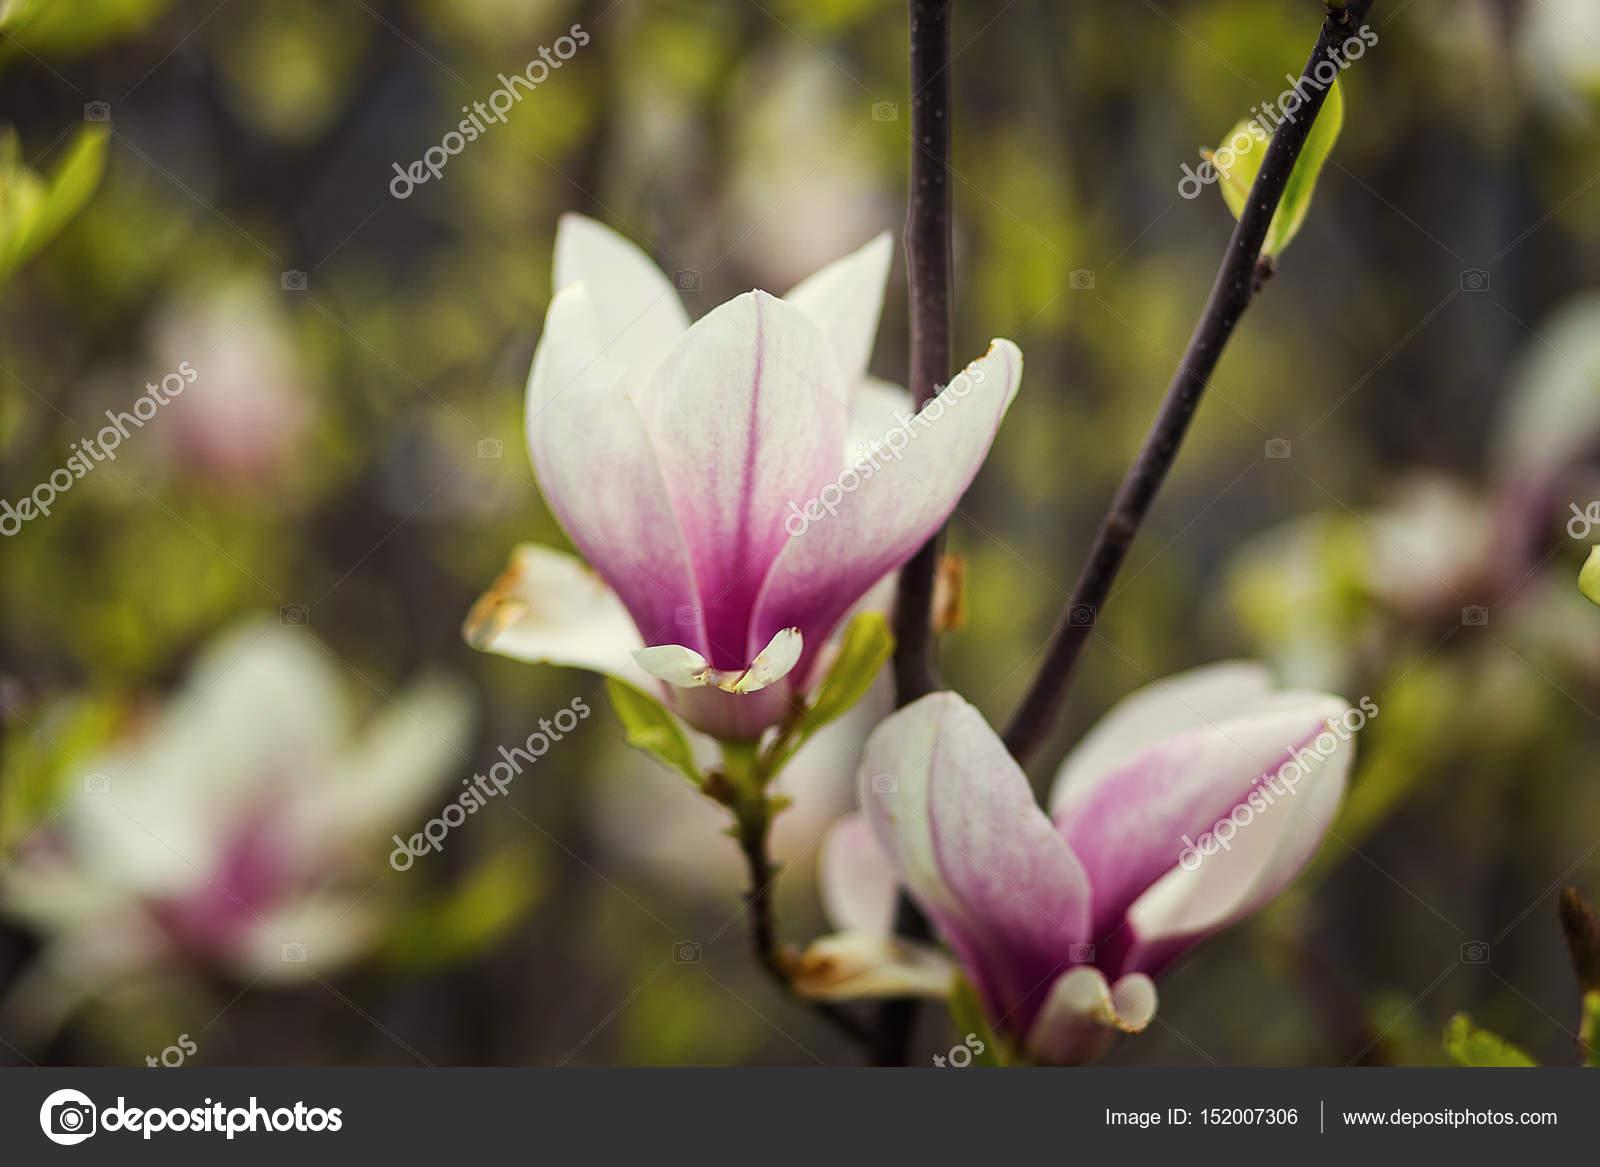 A Magnolia Blossombeautiful Spring Bloom For Magnolia Tulip Trees